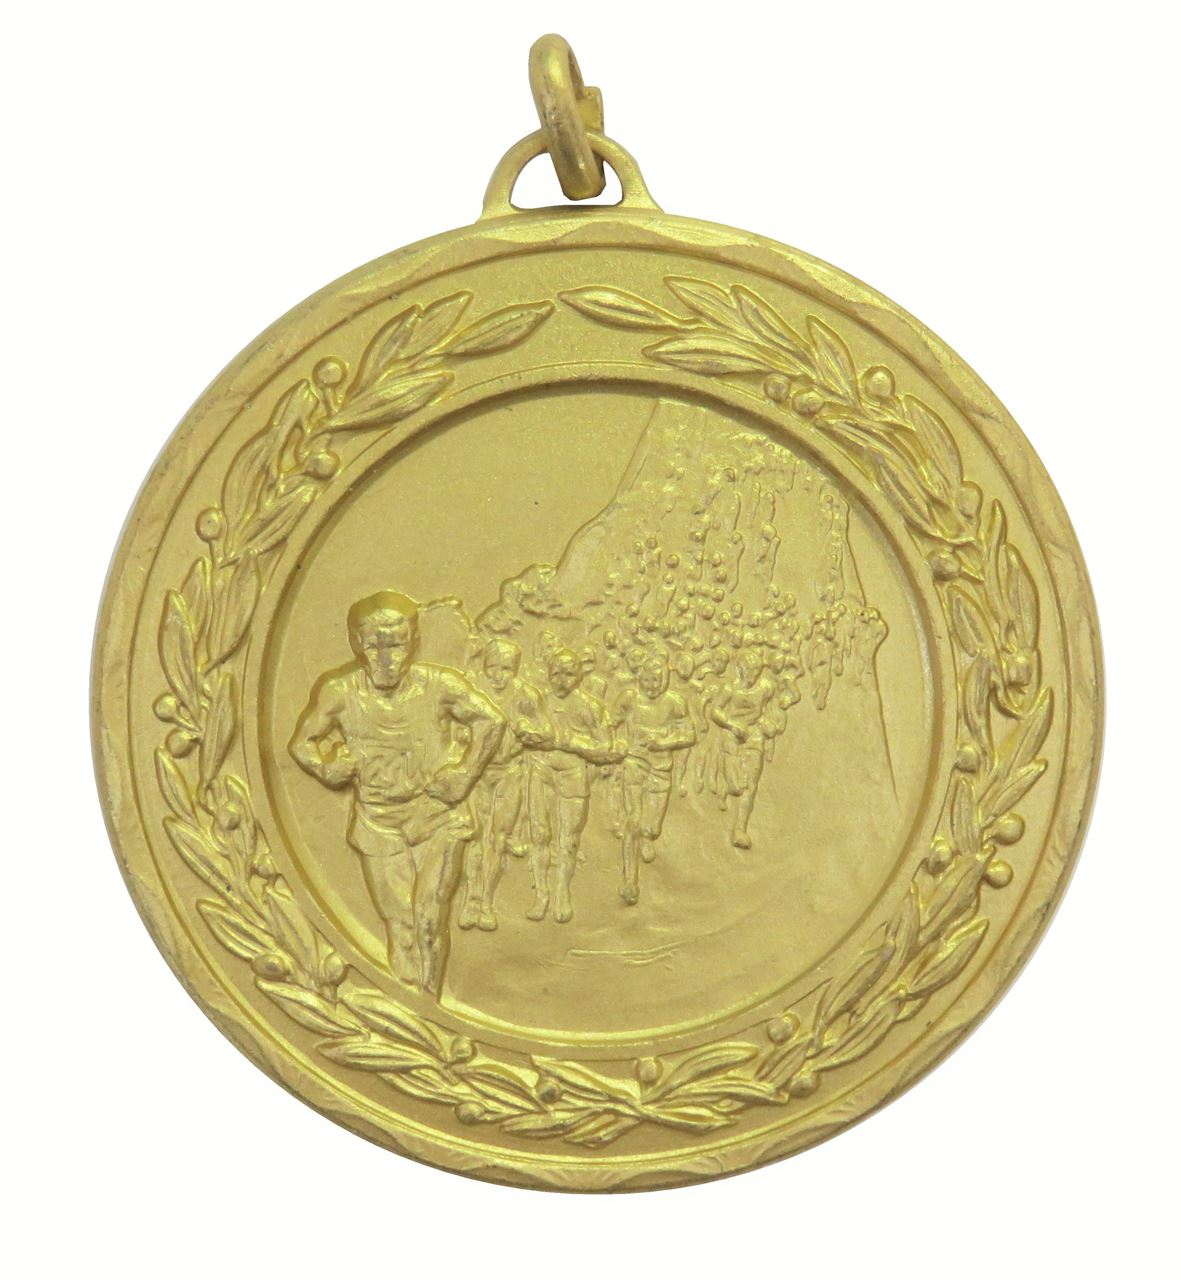 Gold Laurel Economy Marathon Medal (size: 50mm) - 4115E